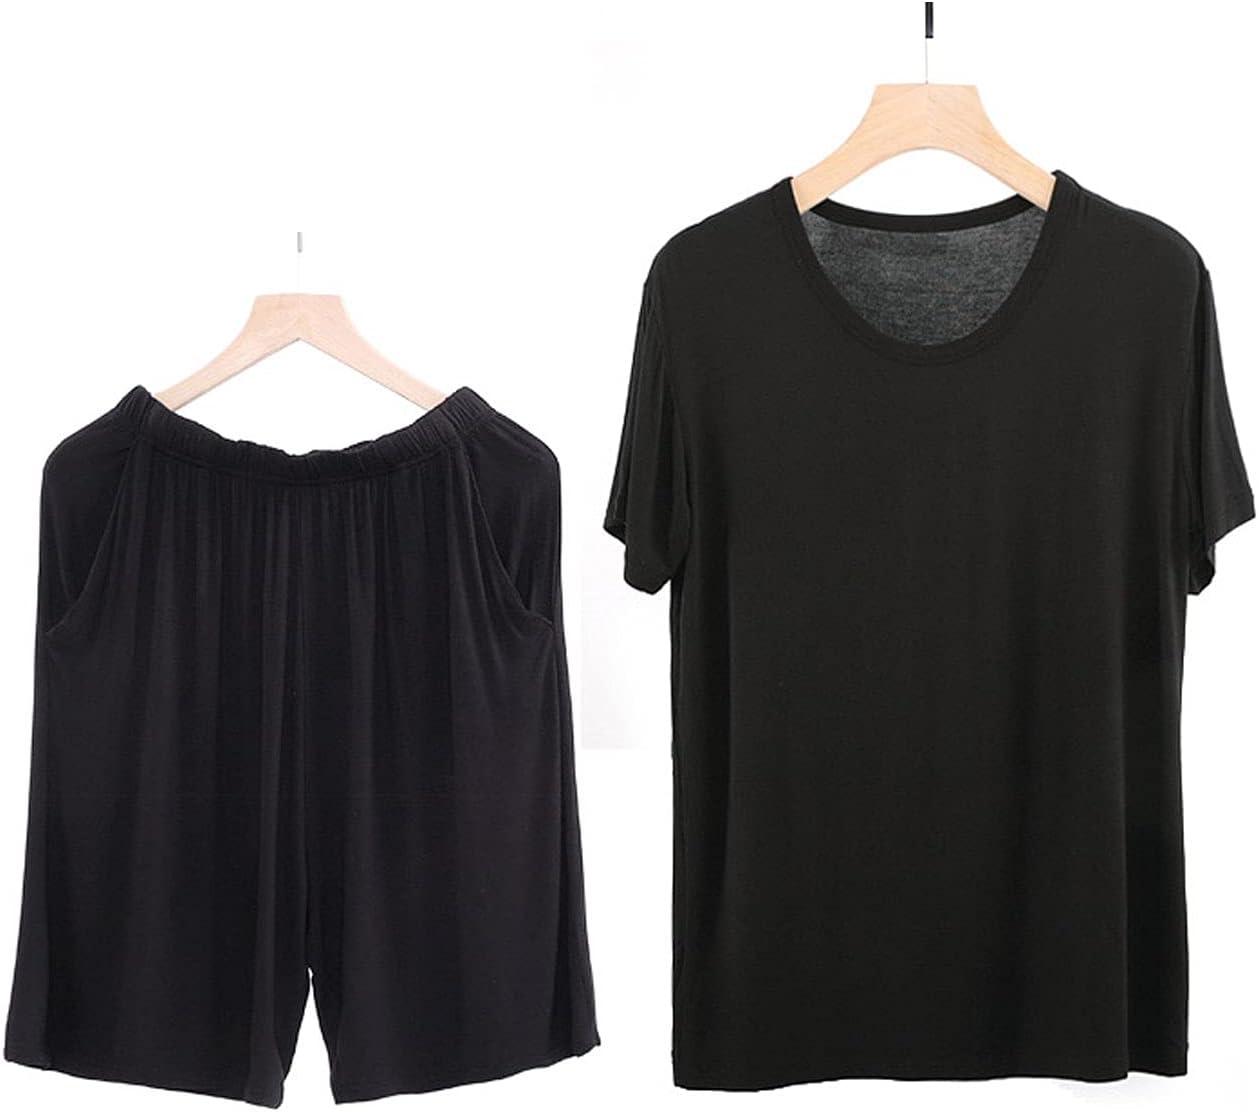 GTHTTT Men's Pajama Set Summer Short Sleeve Sleepwear Shirt Hidden Drawstring Shorts PJ Set 2 Piece Lounge Wear Loungewear